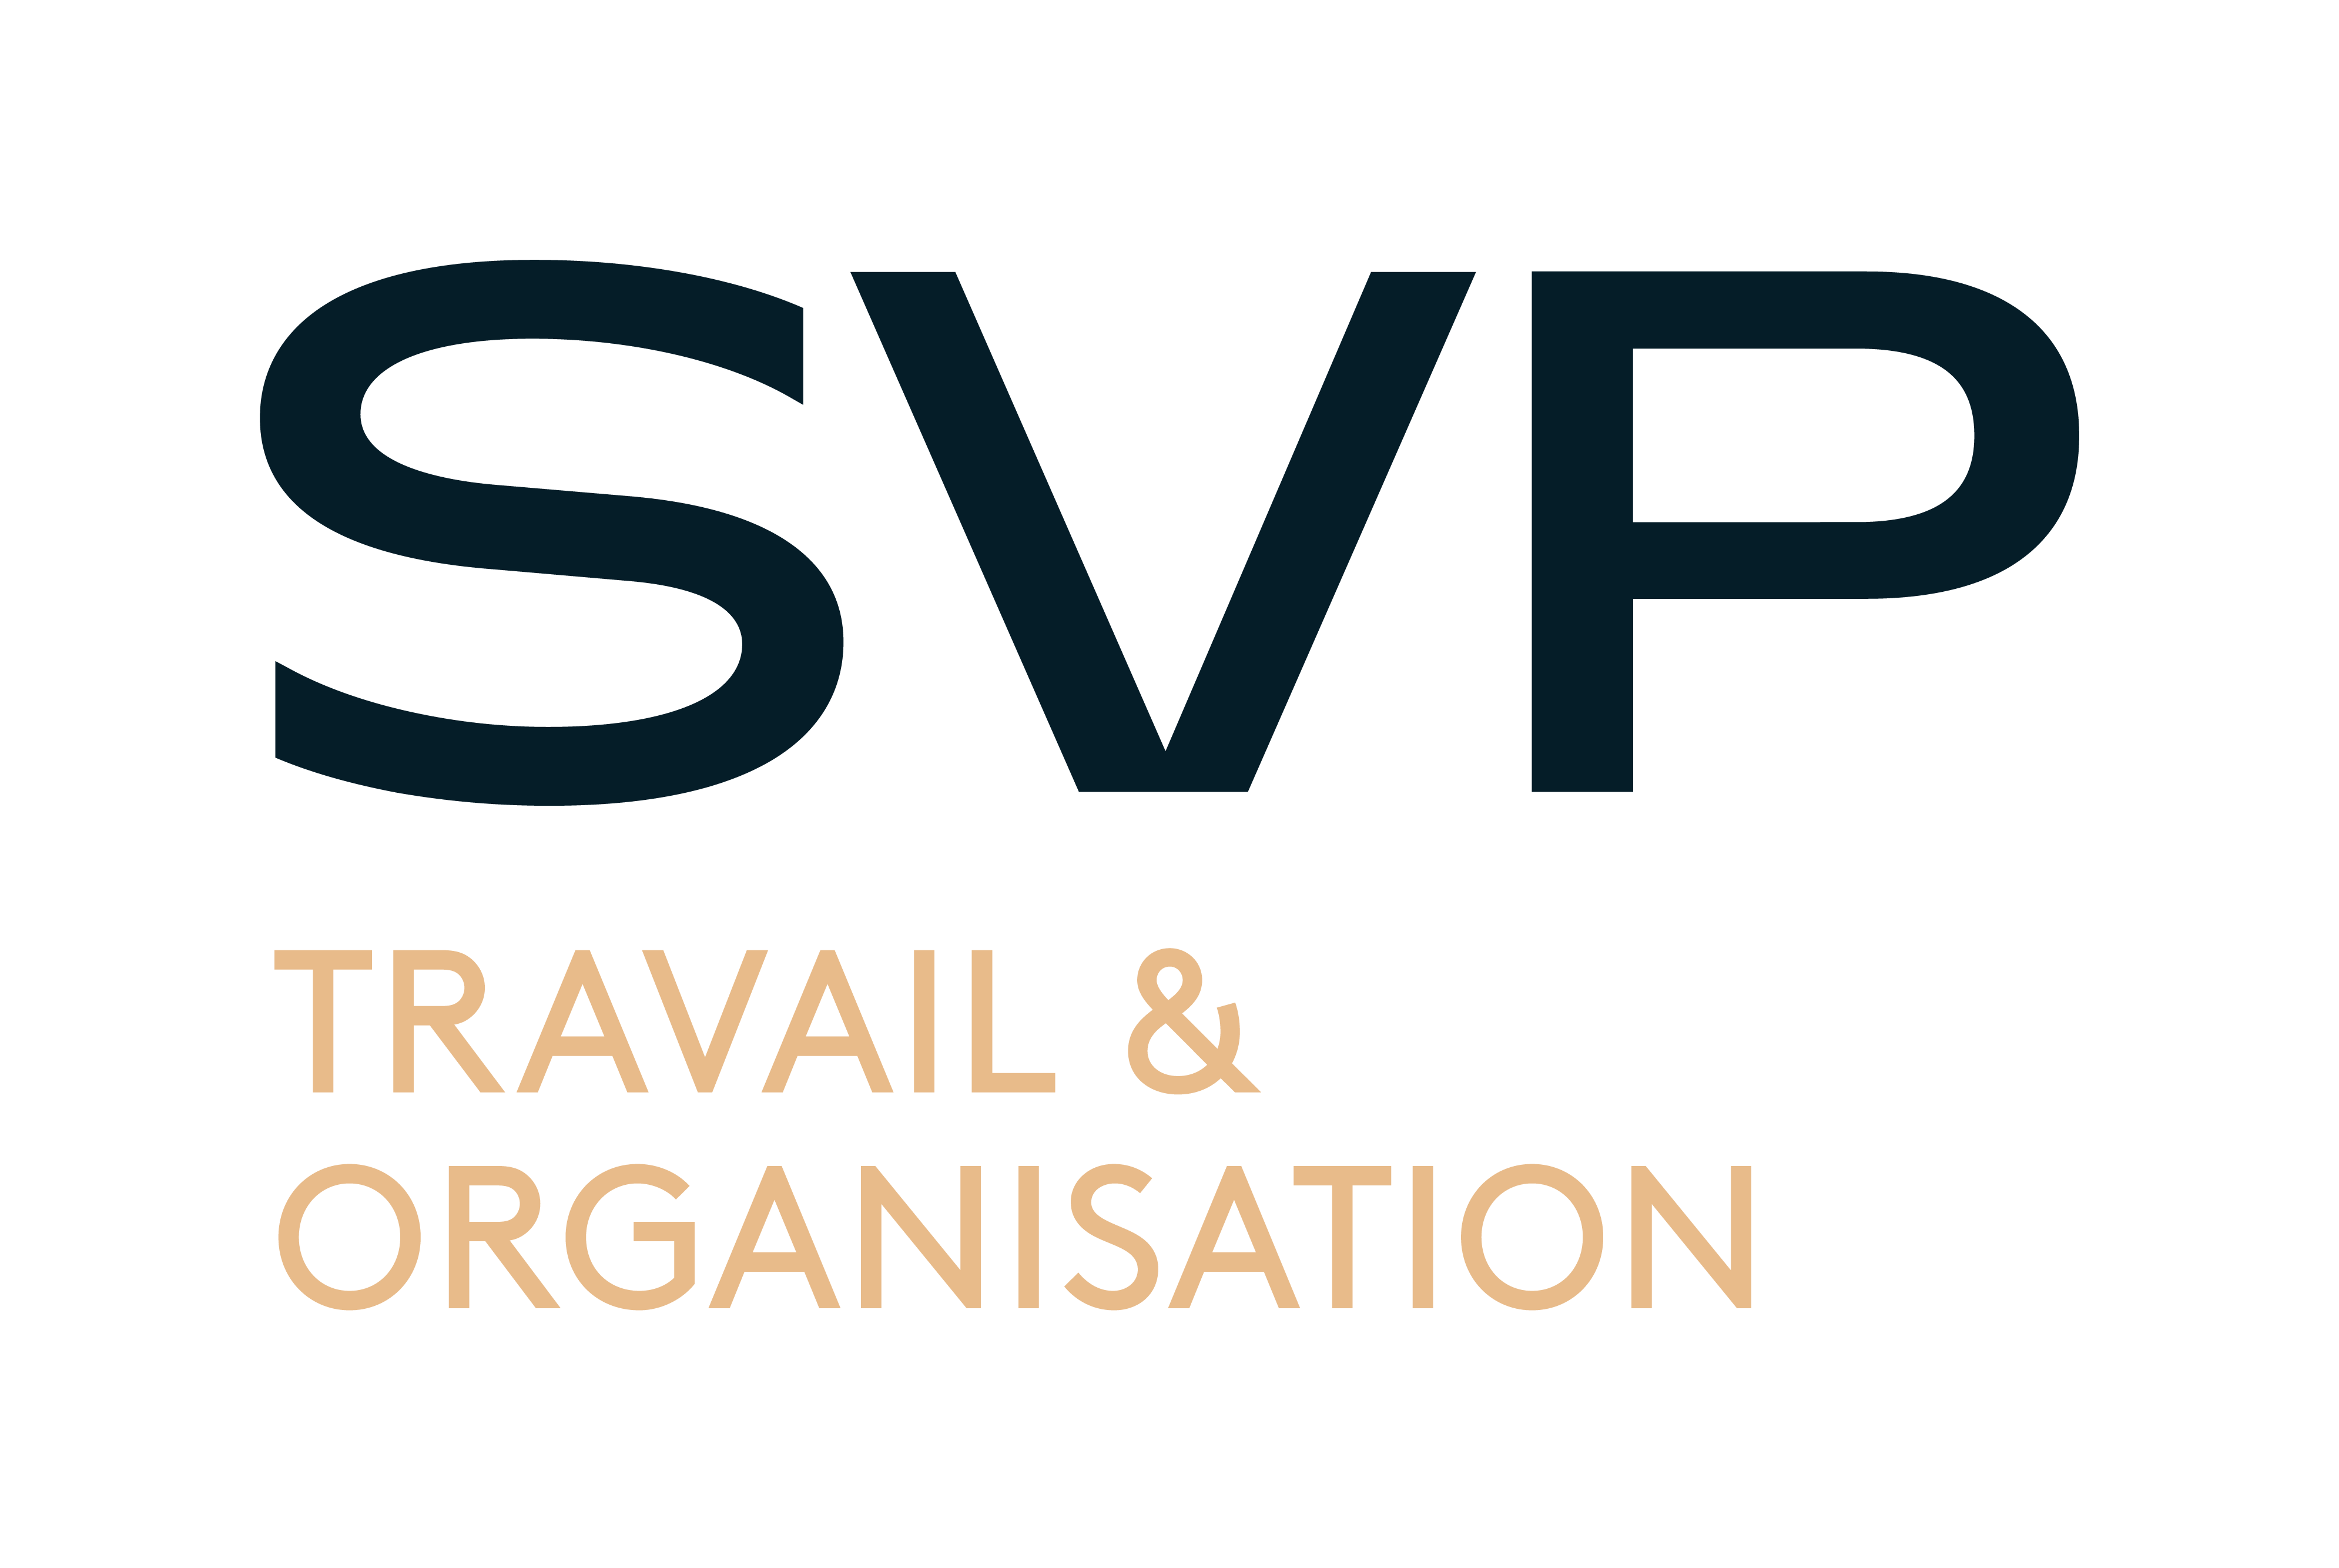 Centre SVP Travail & Organisation  - Saint-Herblain (44)